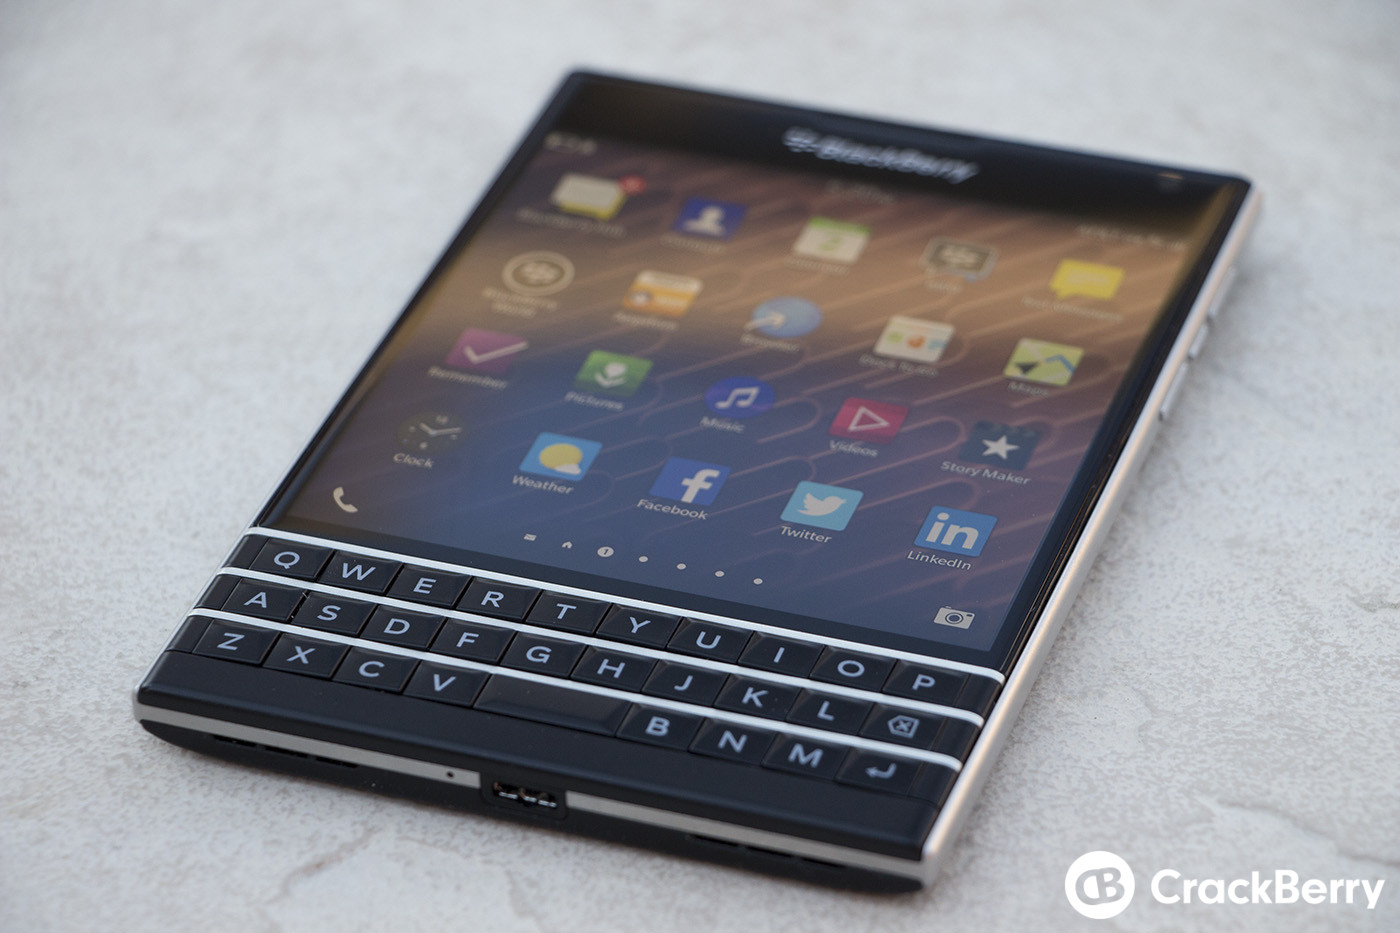 Blackberry dating site in nigeria